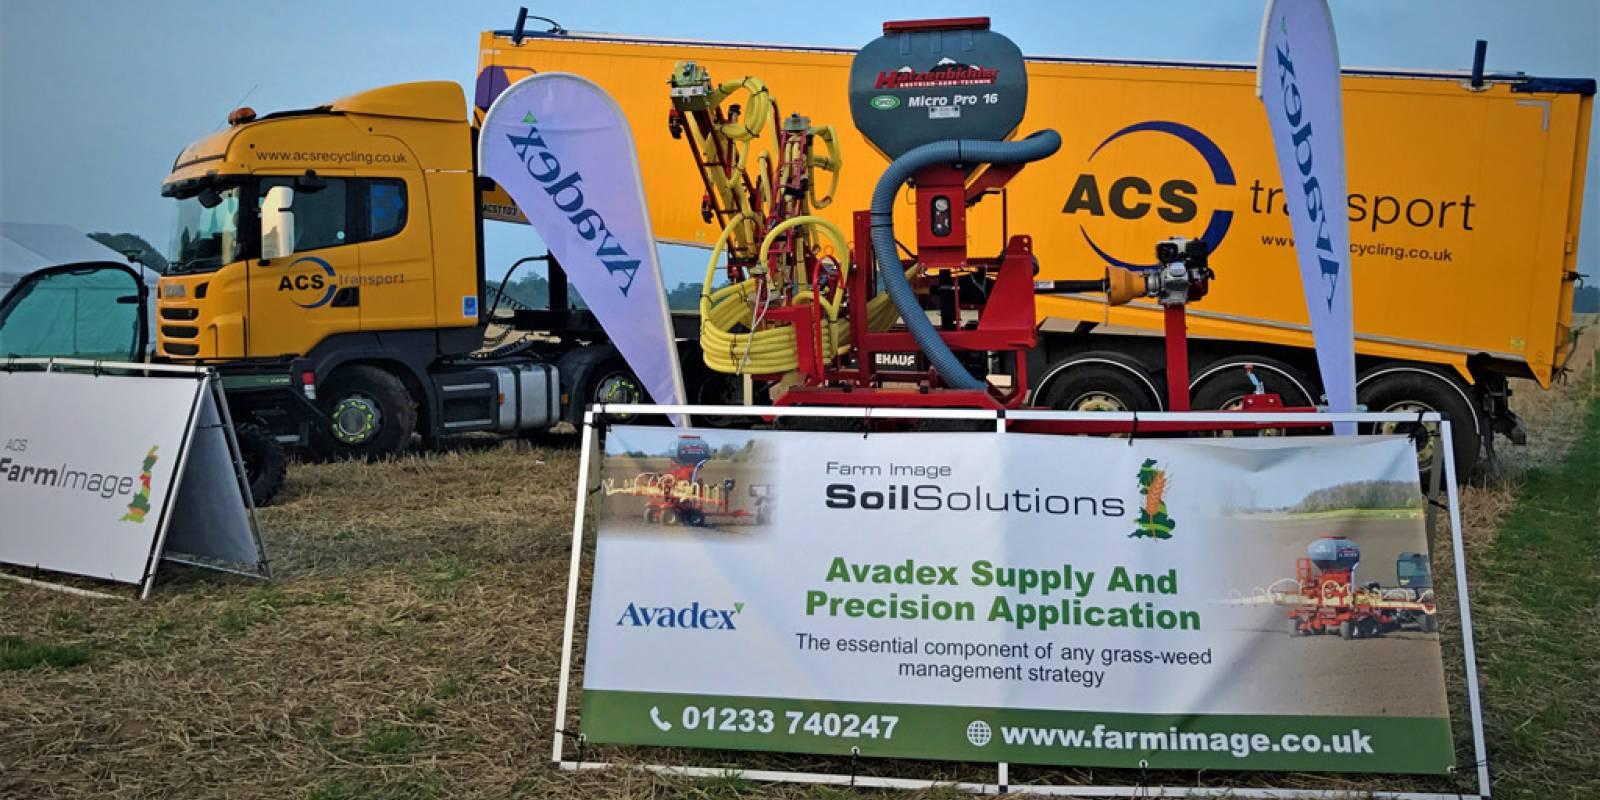 East-Kent-Ploughing-Match-2017-lorry-banner.jpg